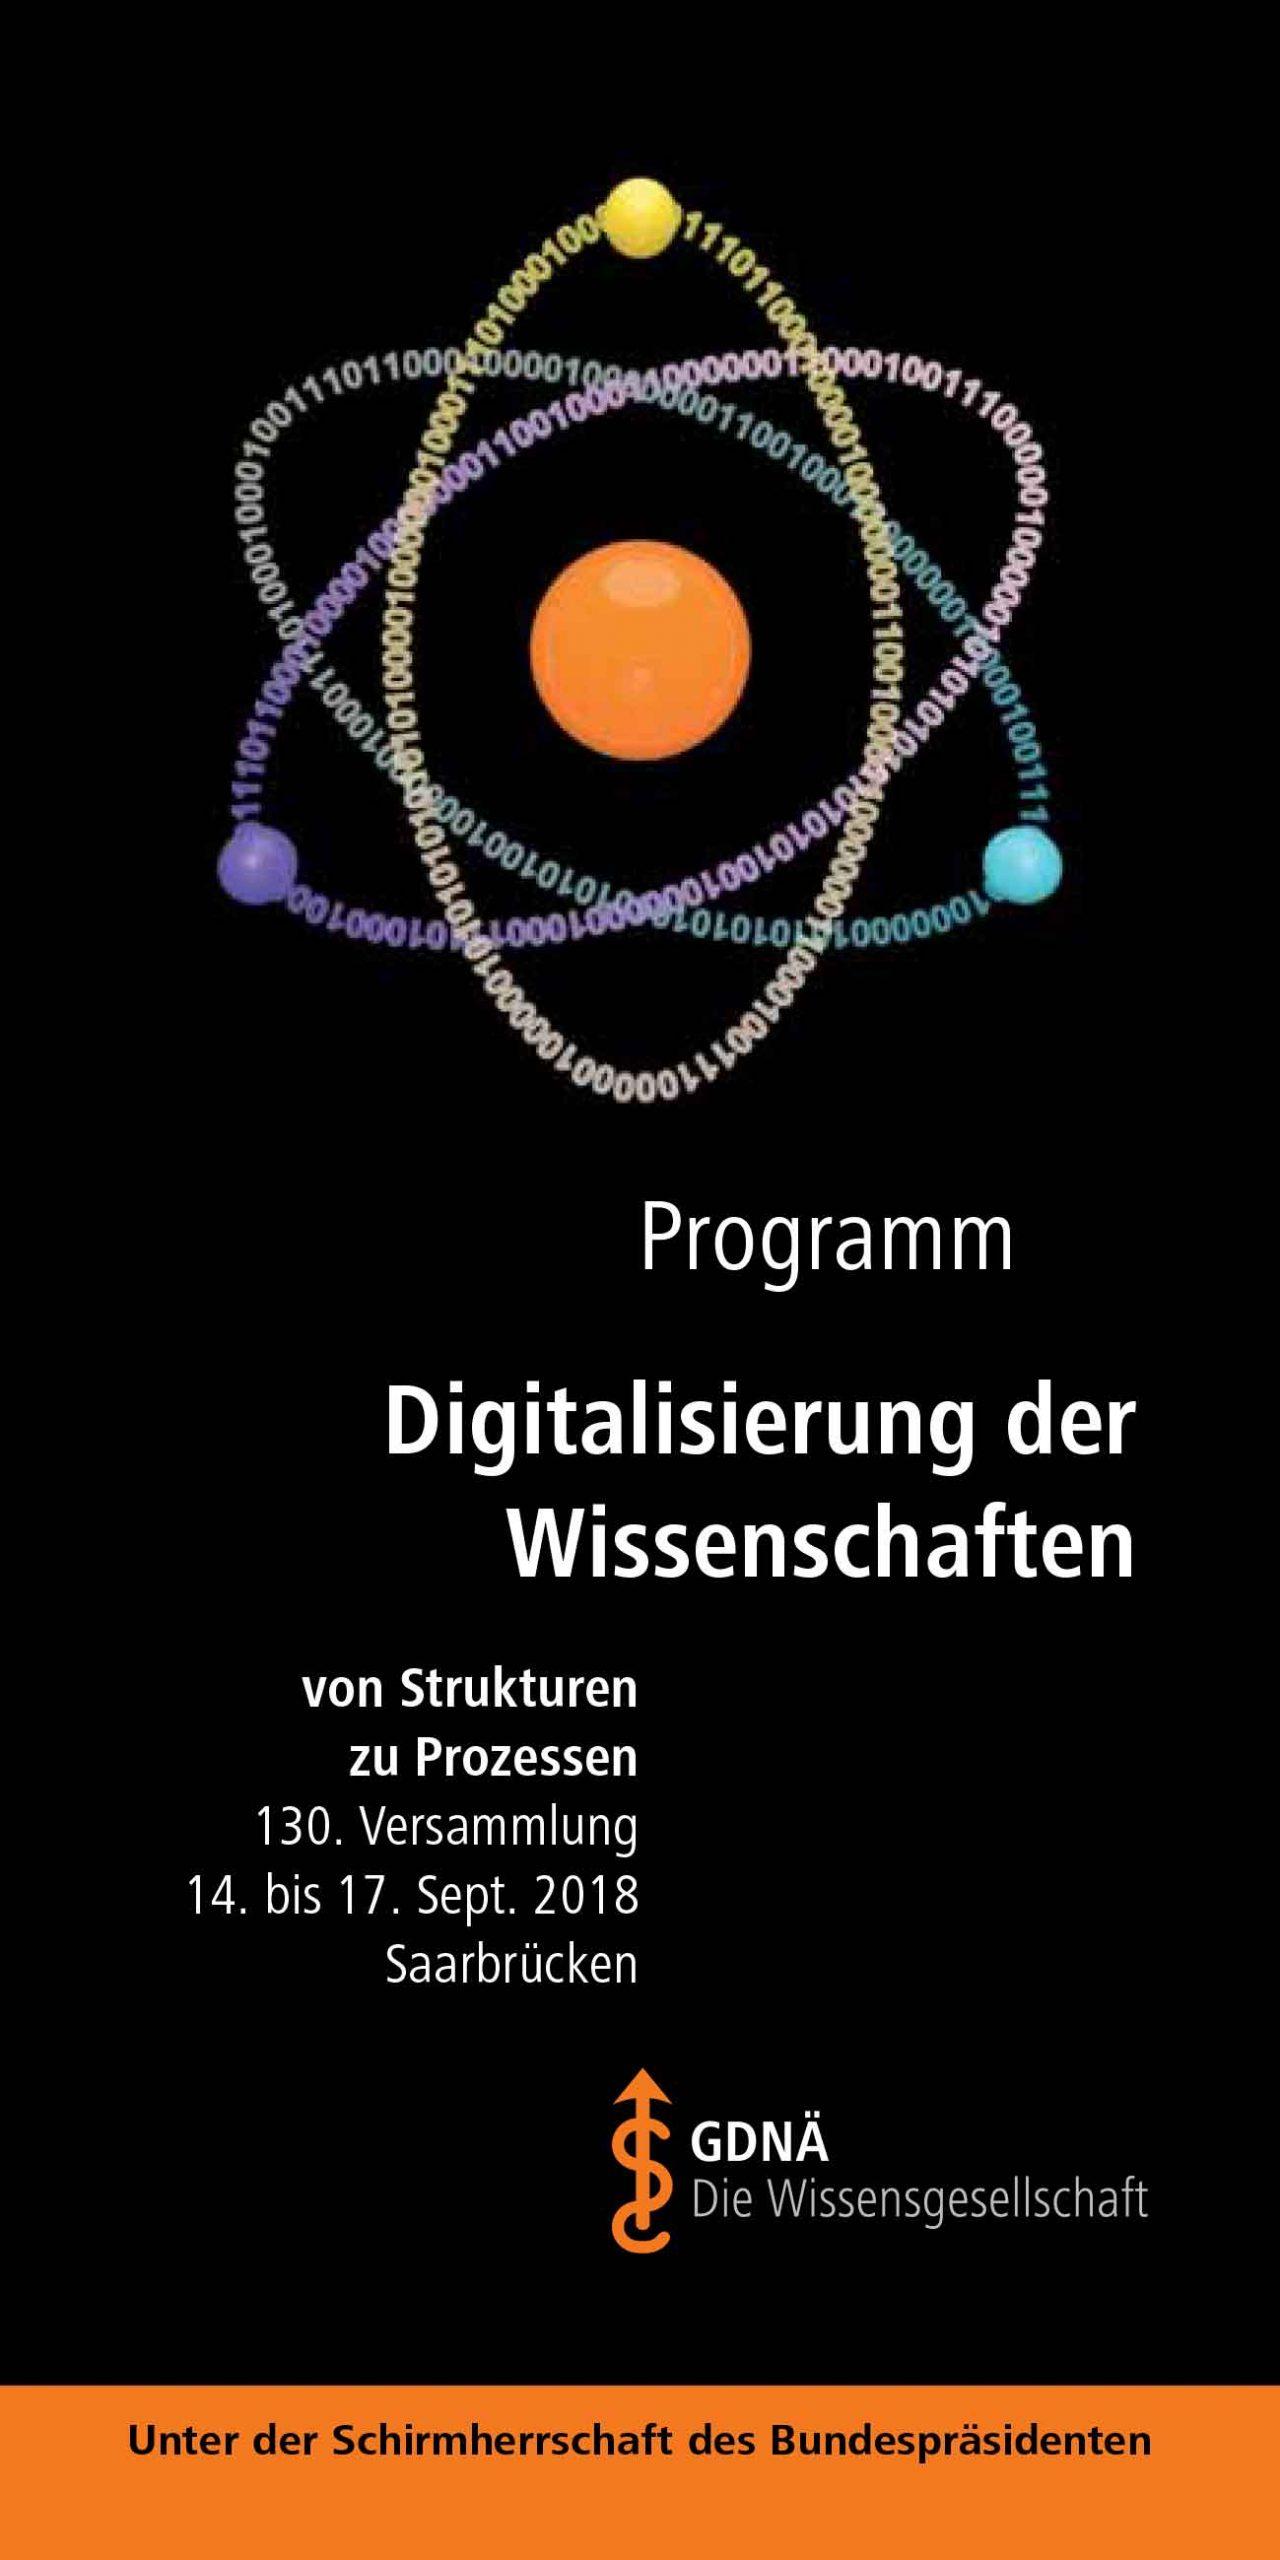 GDNAE Programm 2018 Saarbrücken 1 scaled